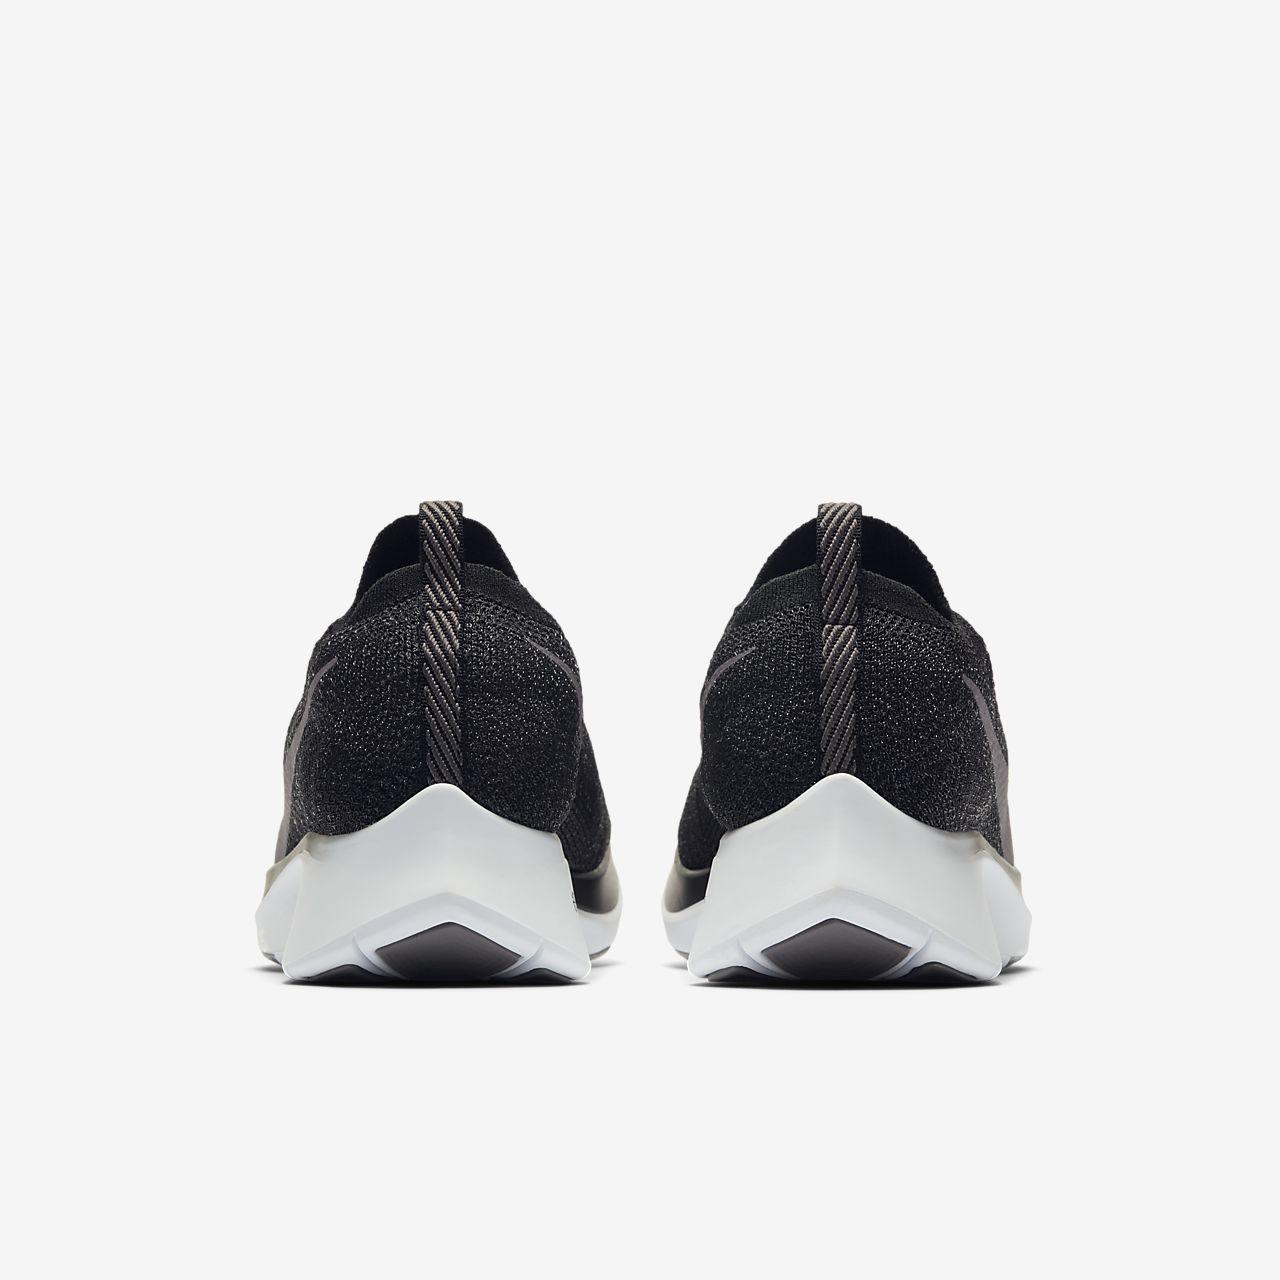 the latest 5b45a 916f0 ... Nike Zoom Fly Flyknit-løbesko til kvinder